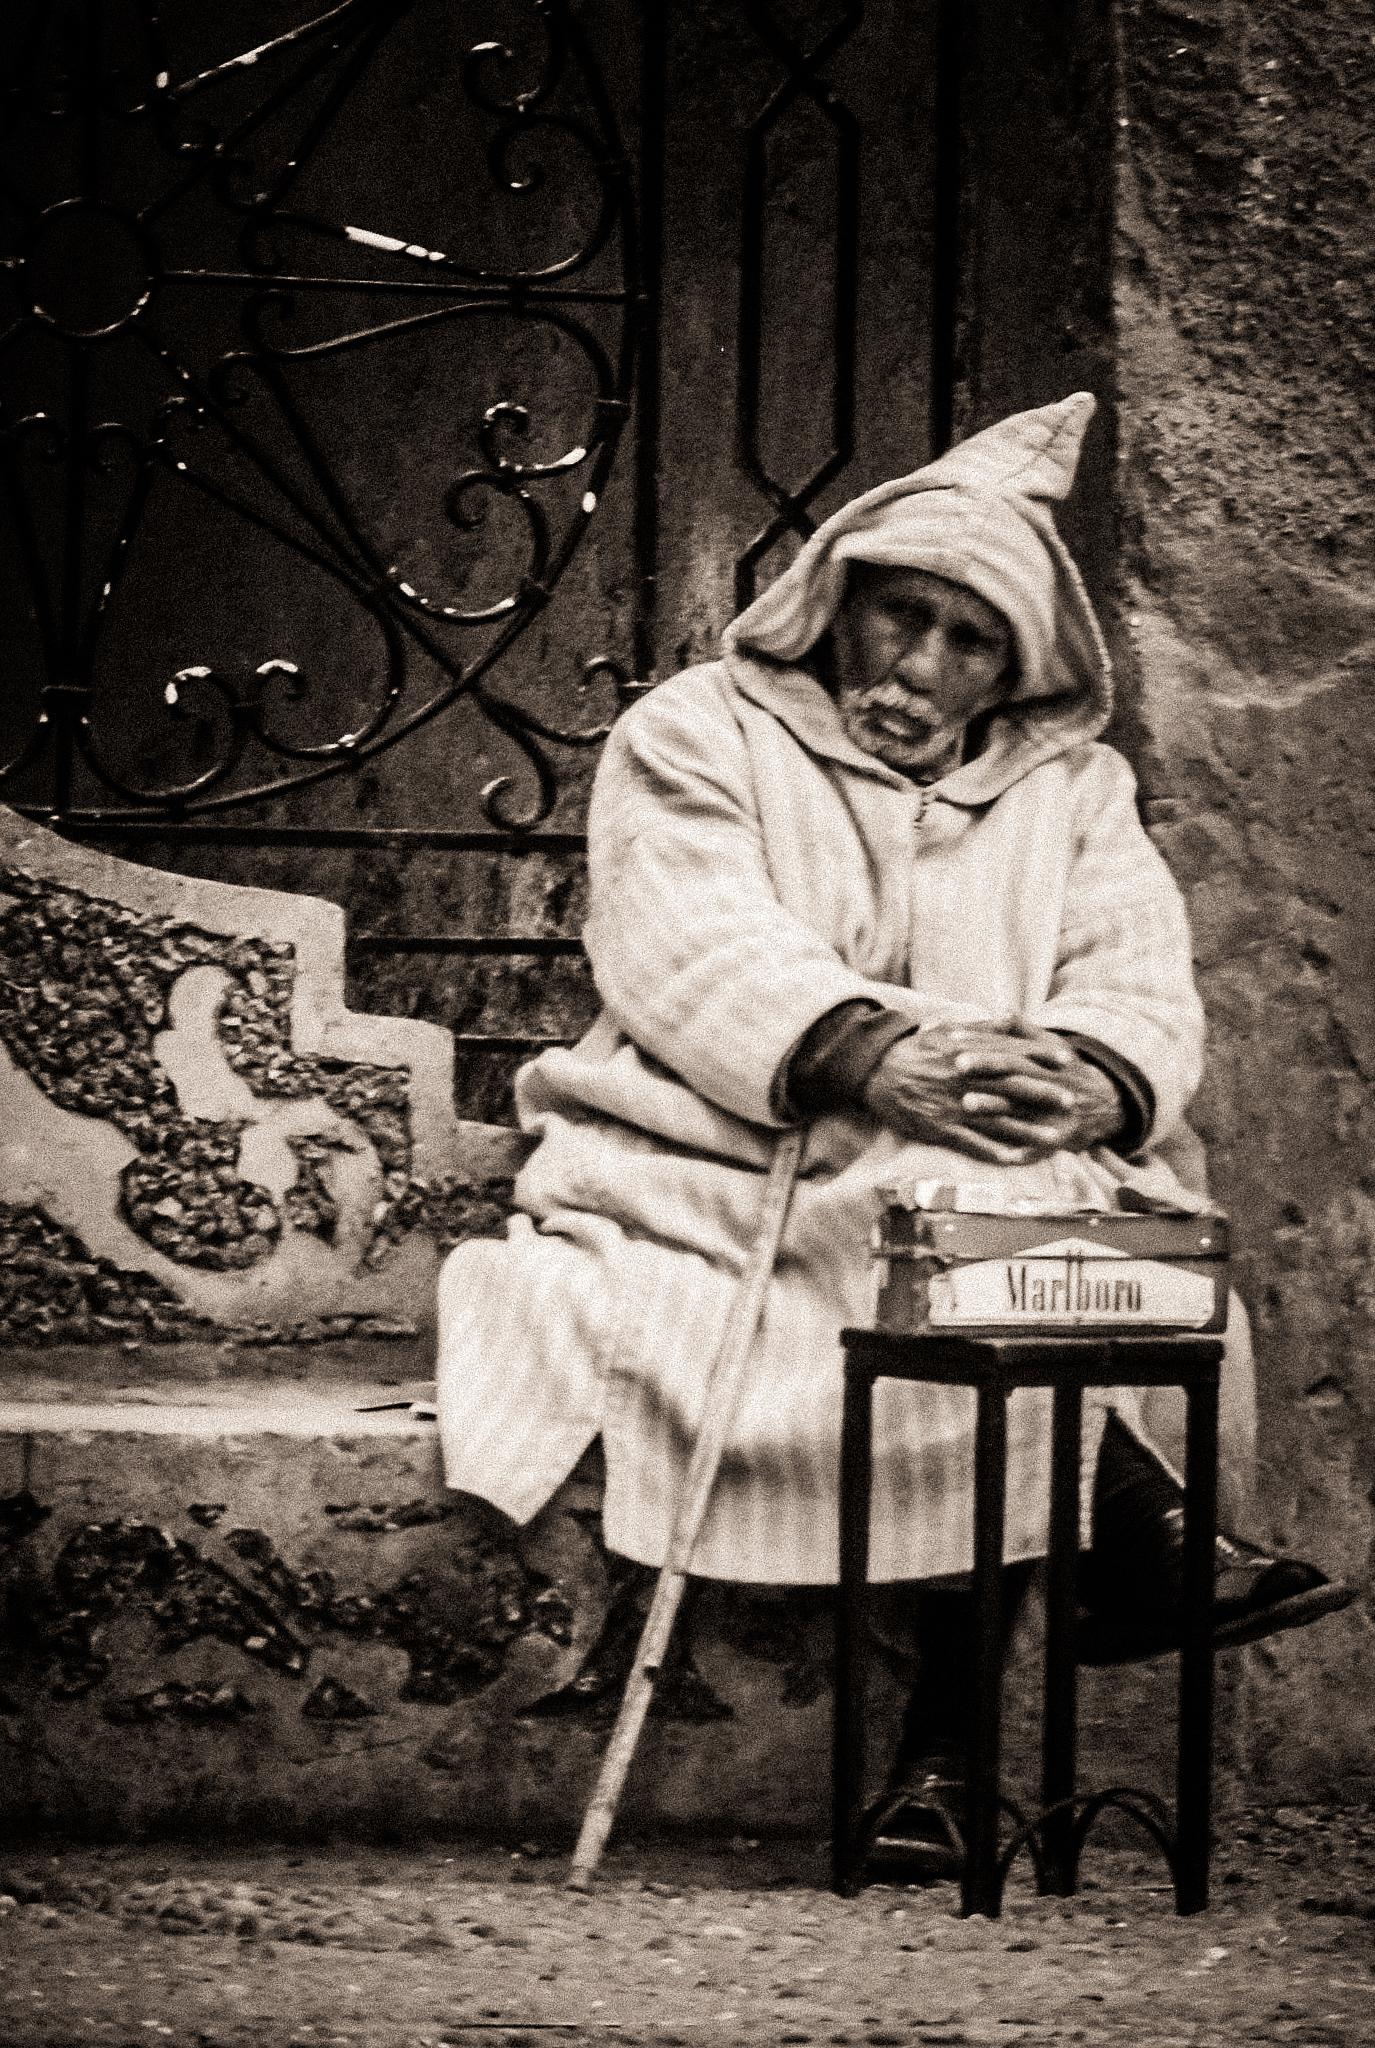 The cigarette vendor - Chaouen by Jean-Marc Schneider